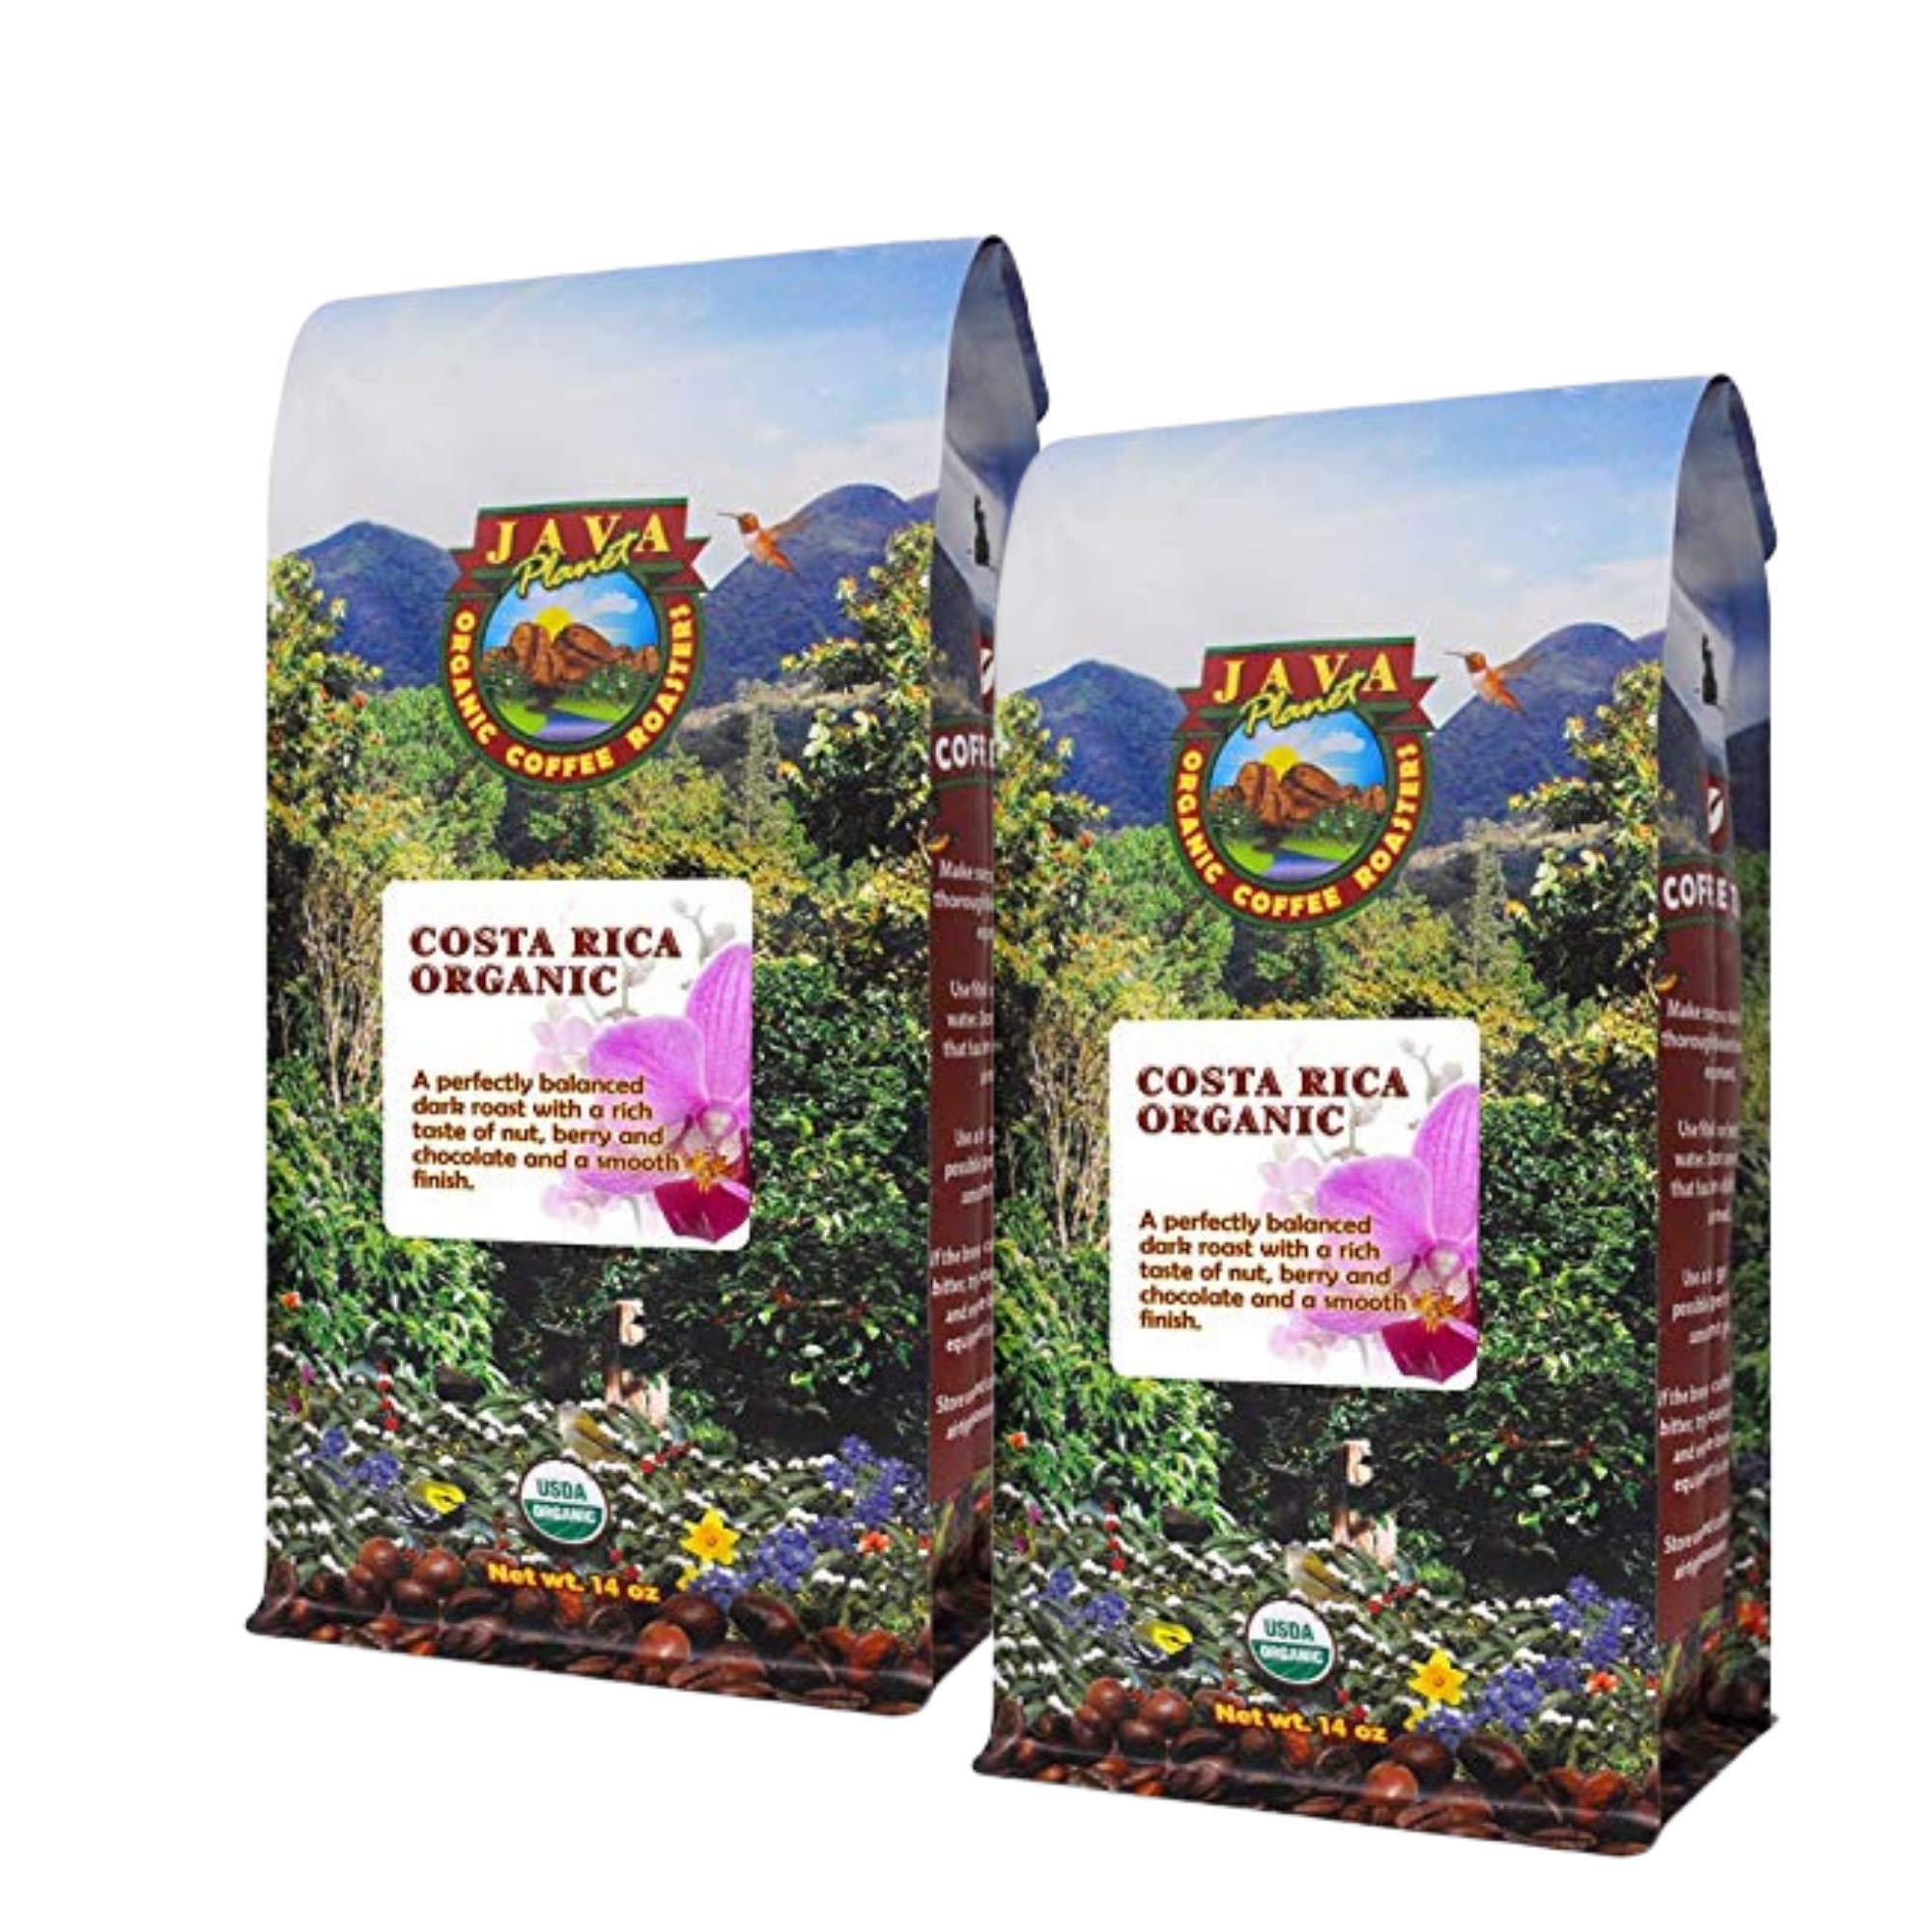 Java Planet, Organic Coffee Beans, Costa Rica Single Origin, Gourmet Dark Roast of Arabica Whole Bean Coffee, Certified Organic, Grown at High Altitudes, 2 14oz bags